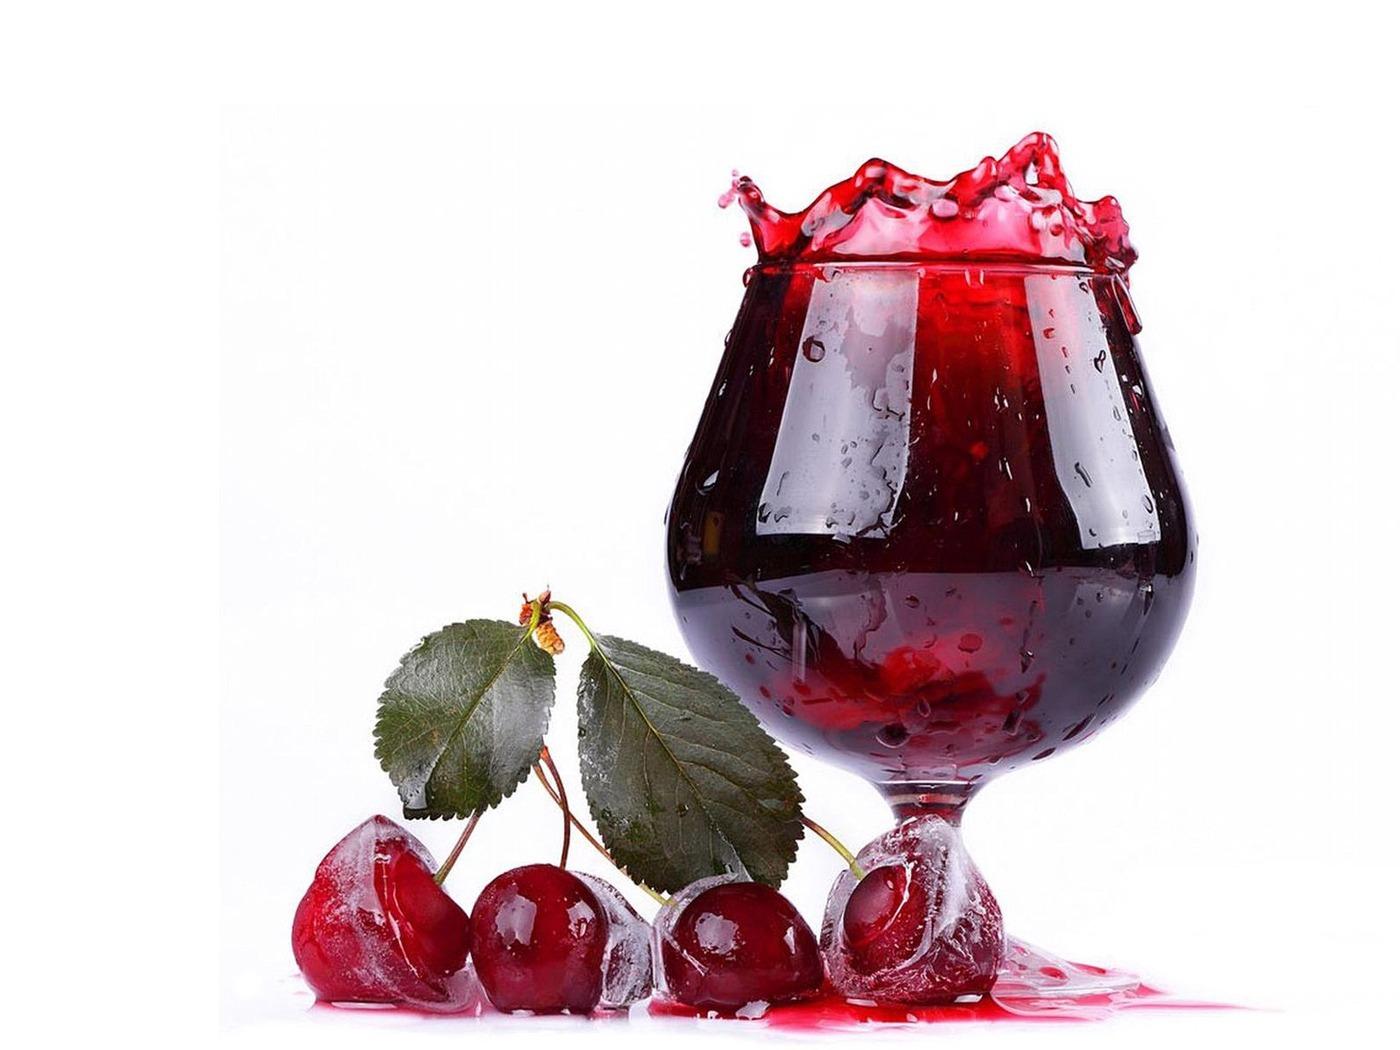 Download wallpaper 1400x1050 juice beverage fruit white 1400x1050